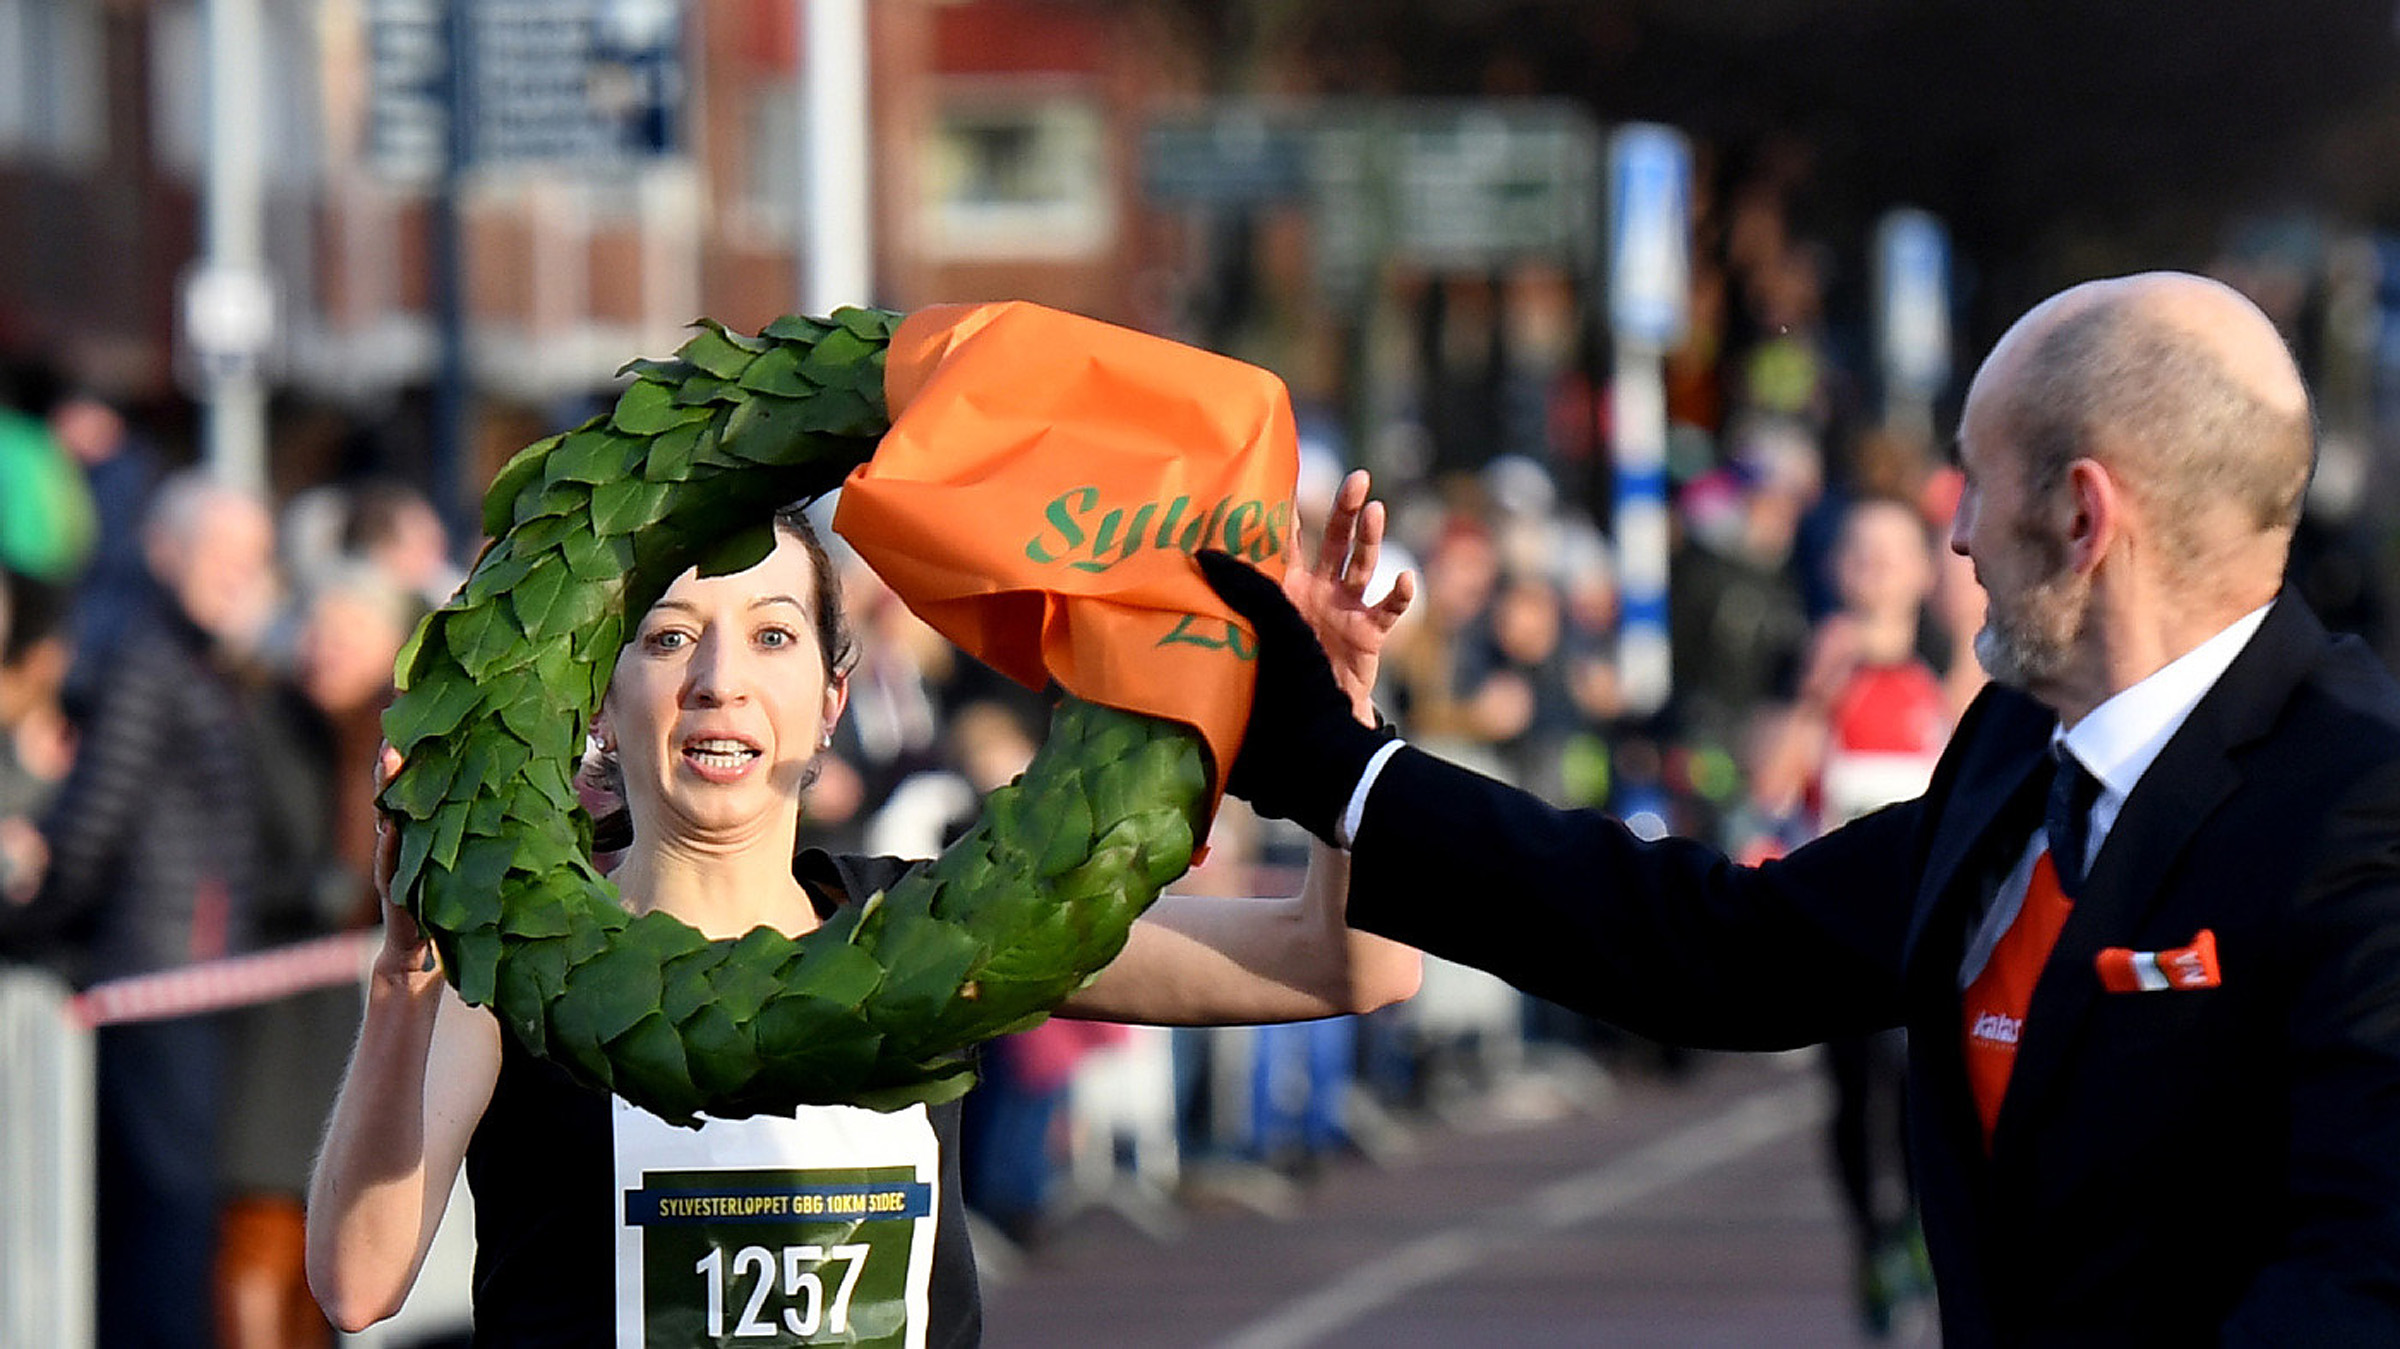 Annie Bersagel segrade i Sylvesterloppet i Göteborg. Foto: Deca Text&Bild